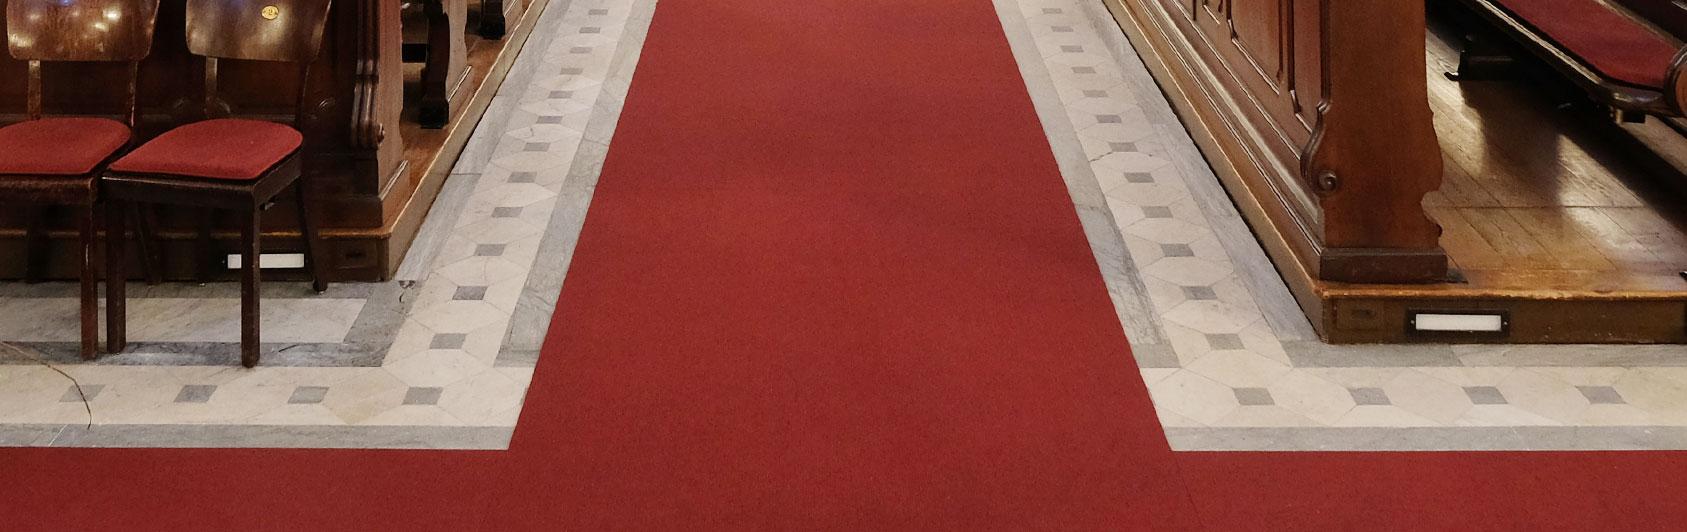 church carpet Perlon Rips